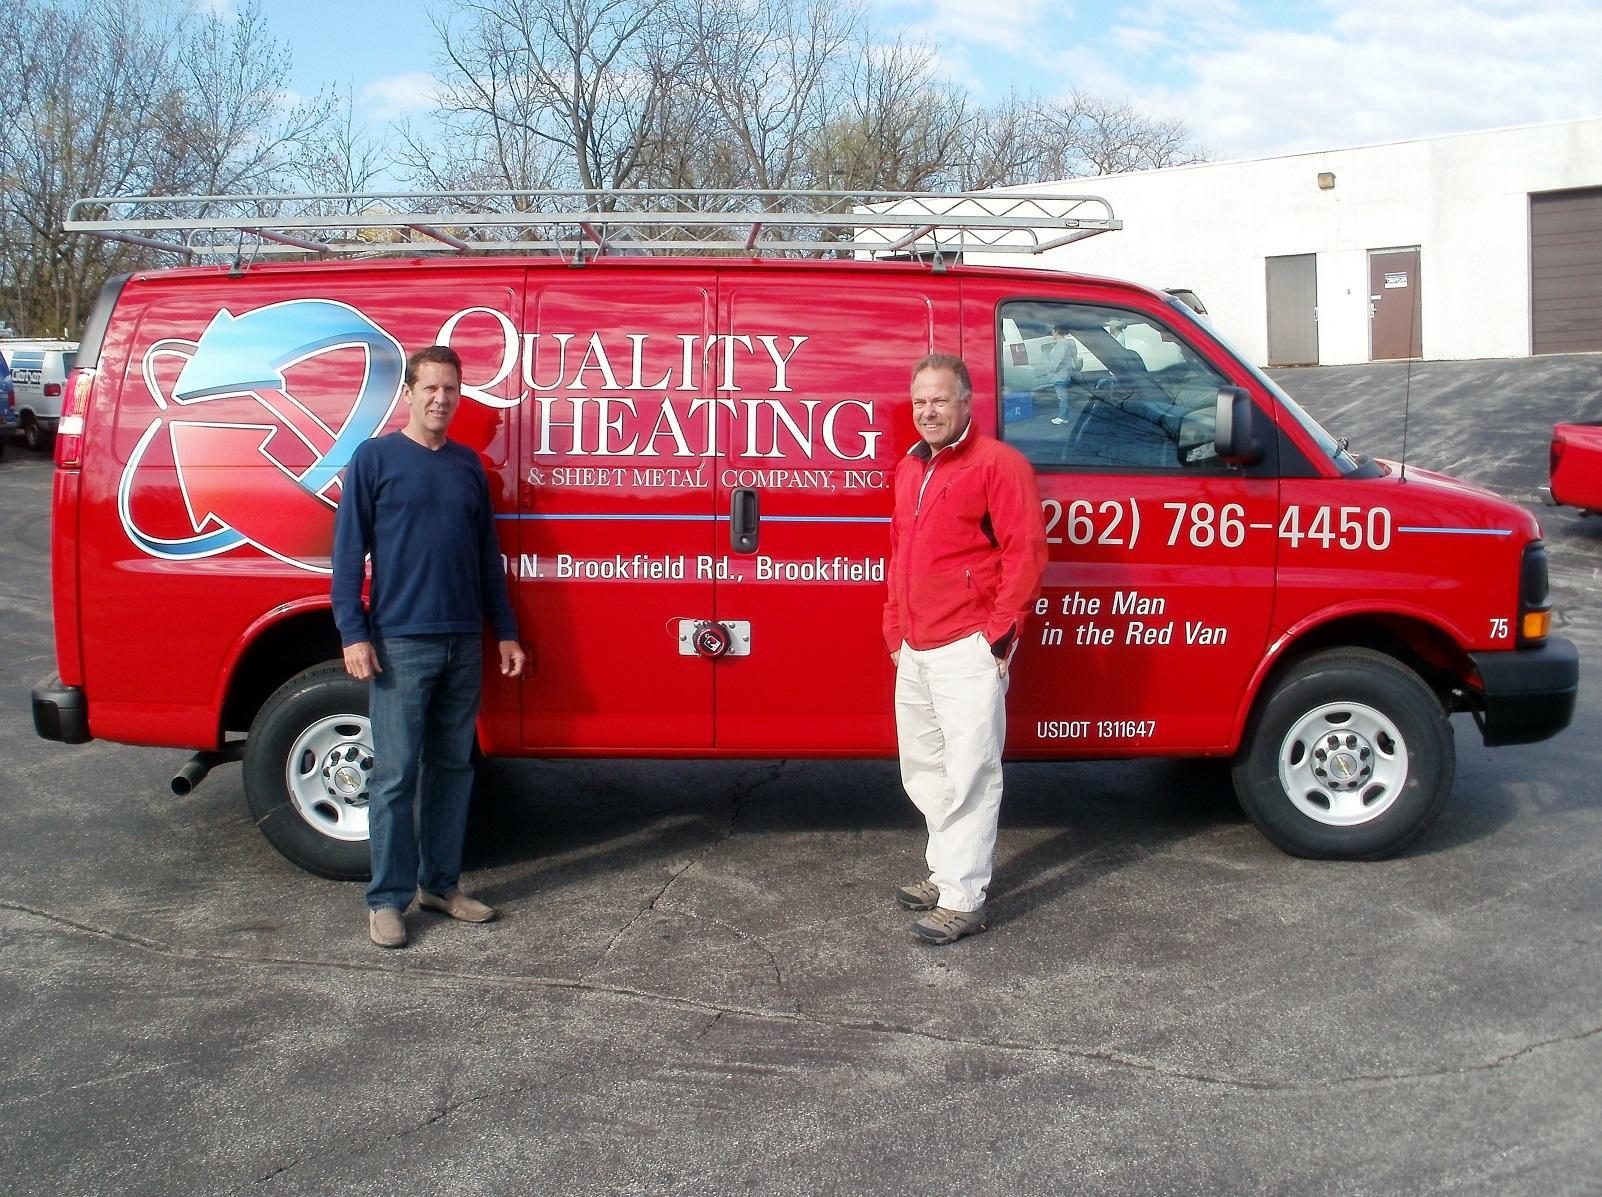 Quality Heating & Sheet Metal Company, Inc. image 2